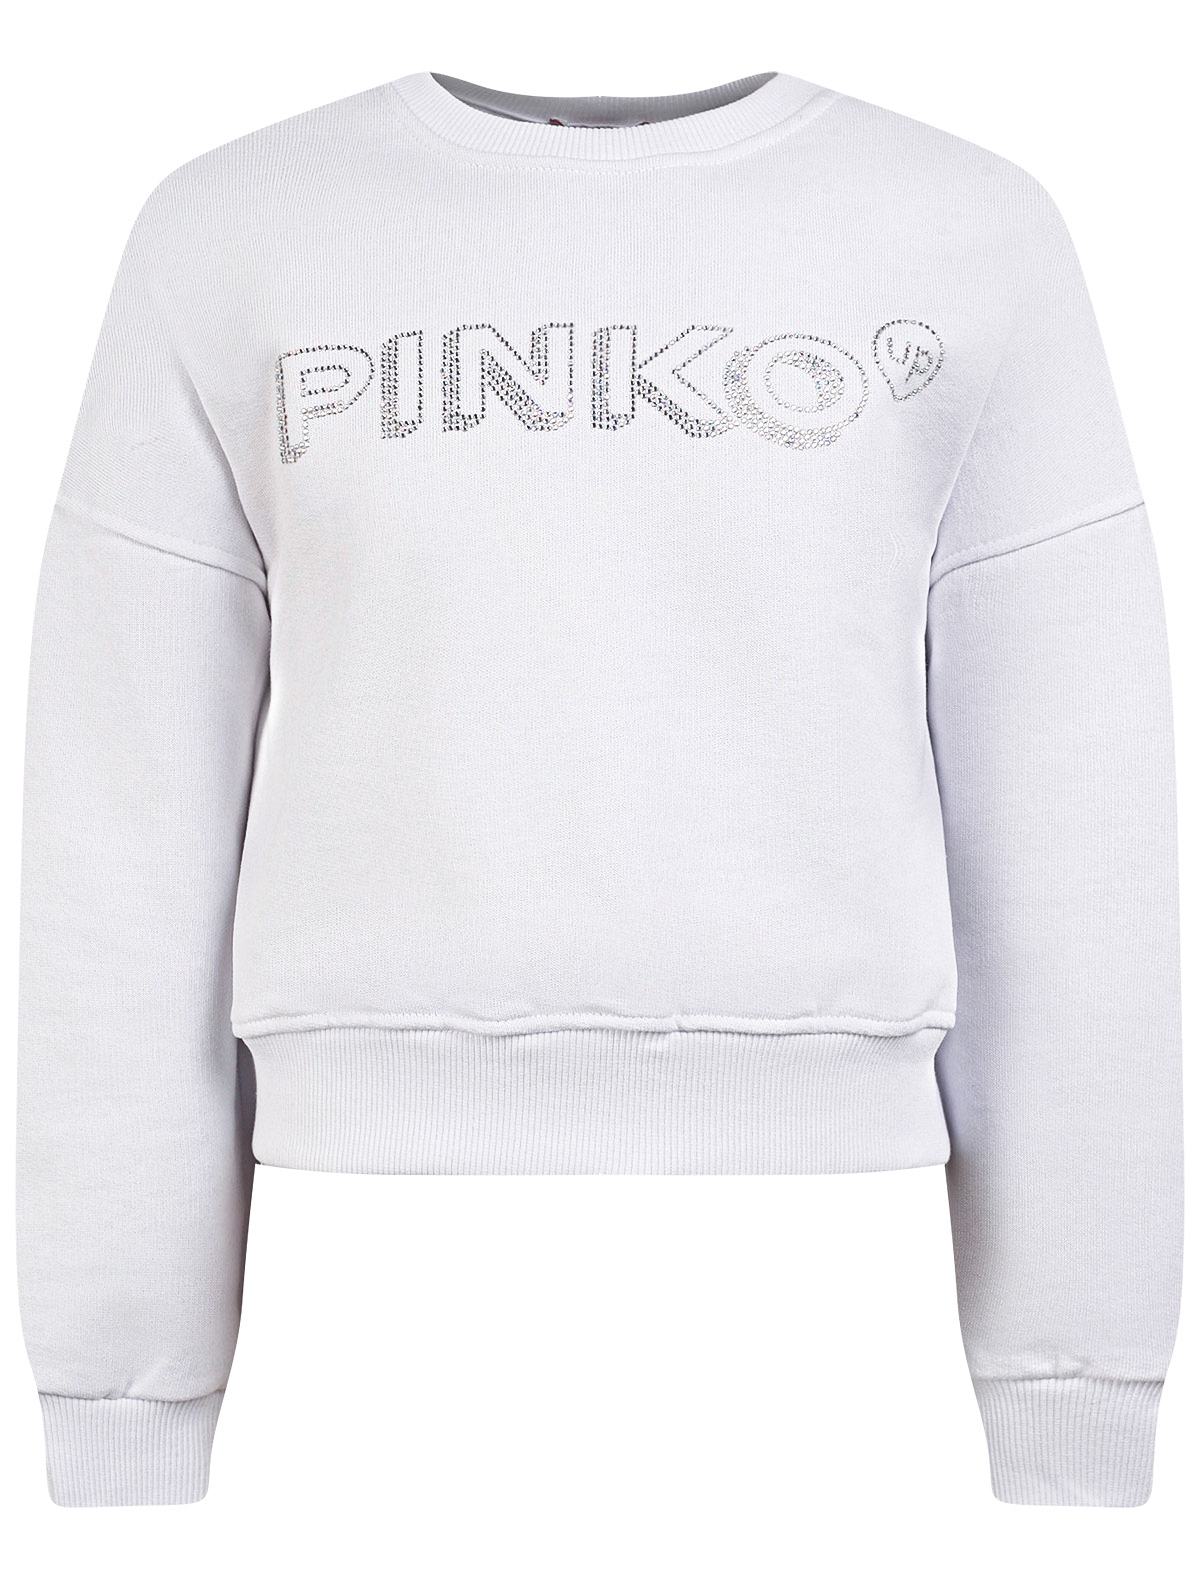 Купить 2276507, Свитшот Pinko Up, белый, Женский, 0084509171041